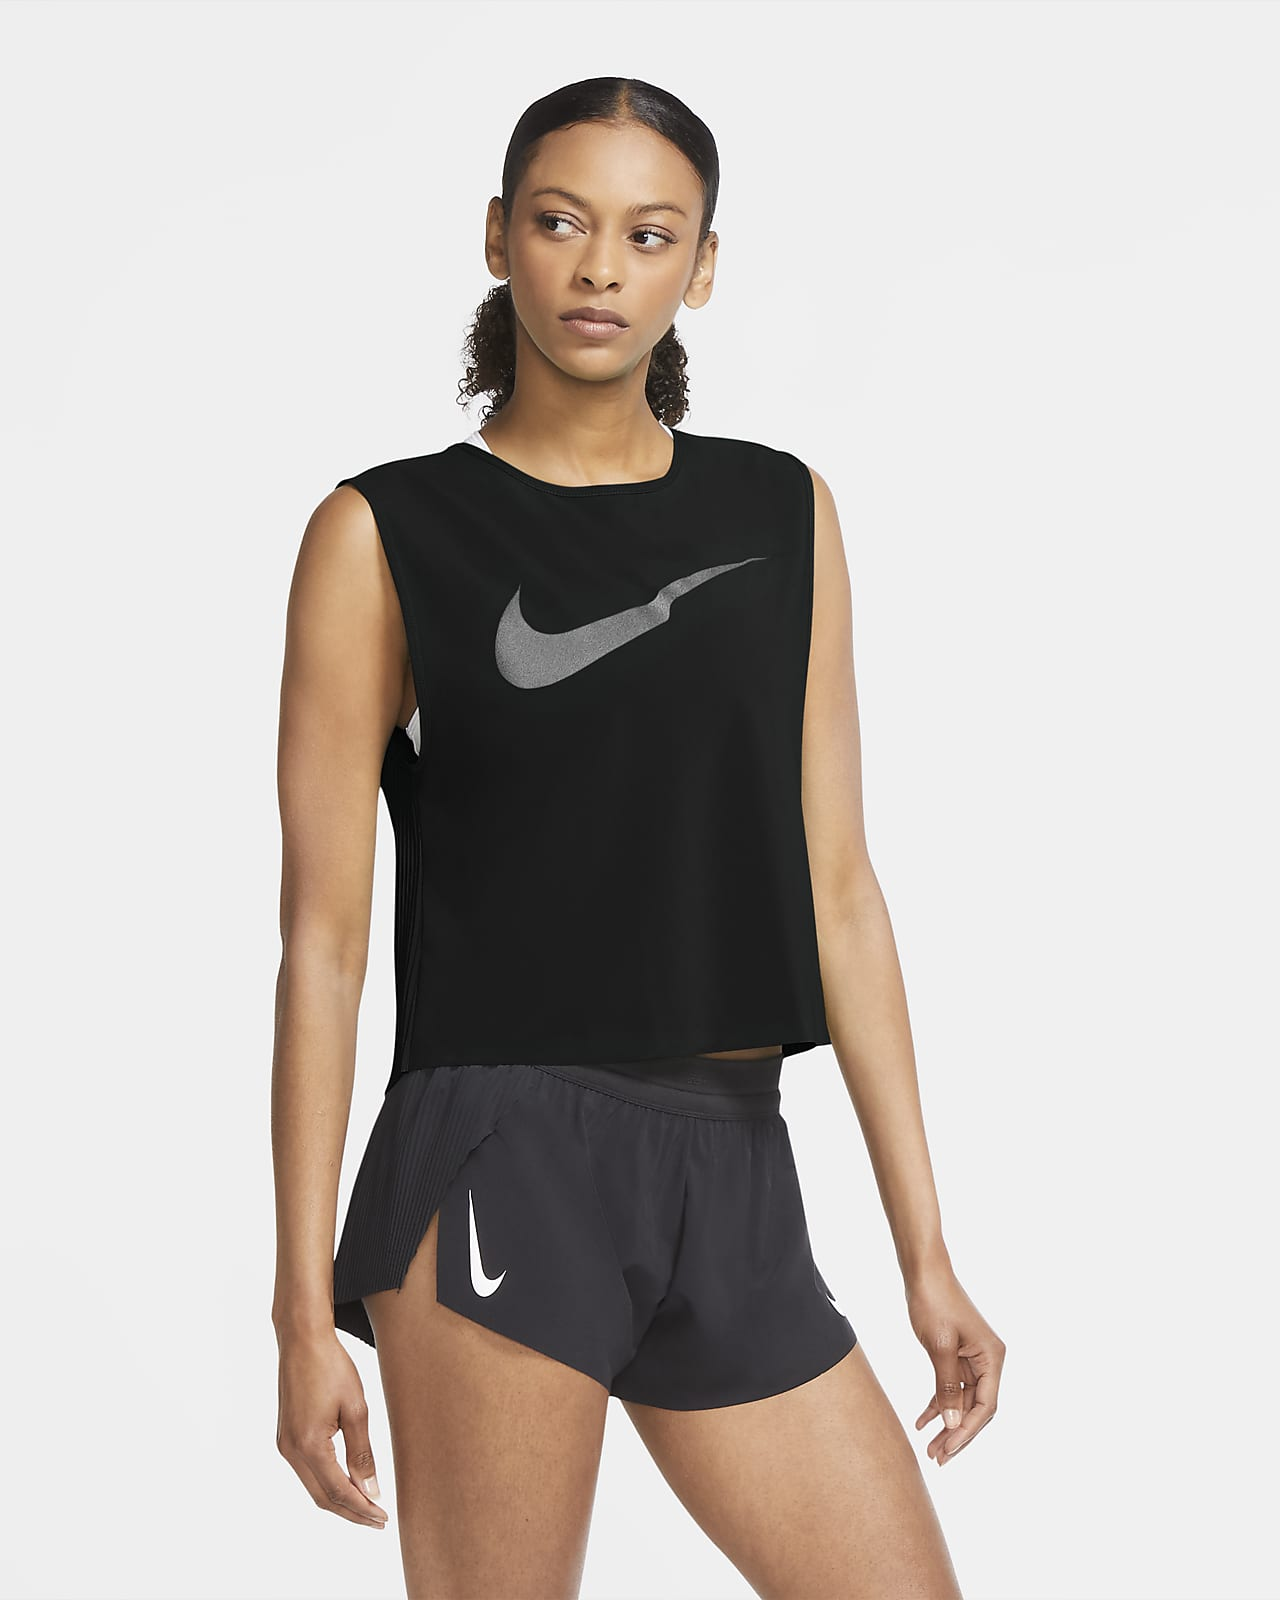 Nike Run Division Pilili Kadın Koşu Atleti